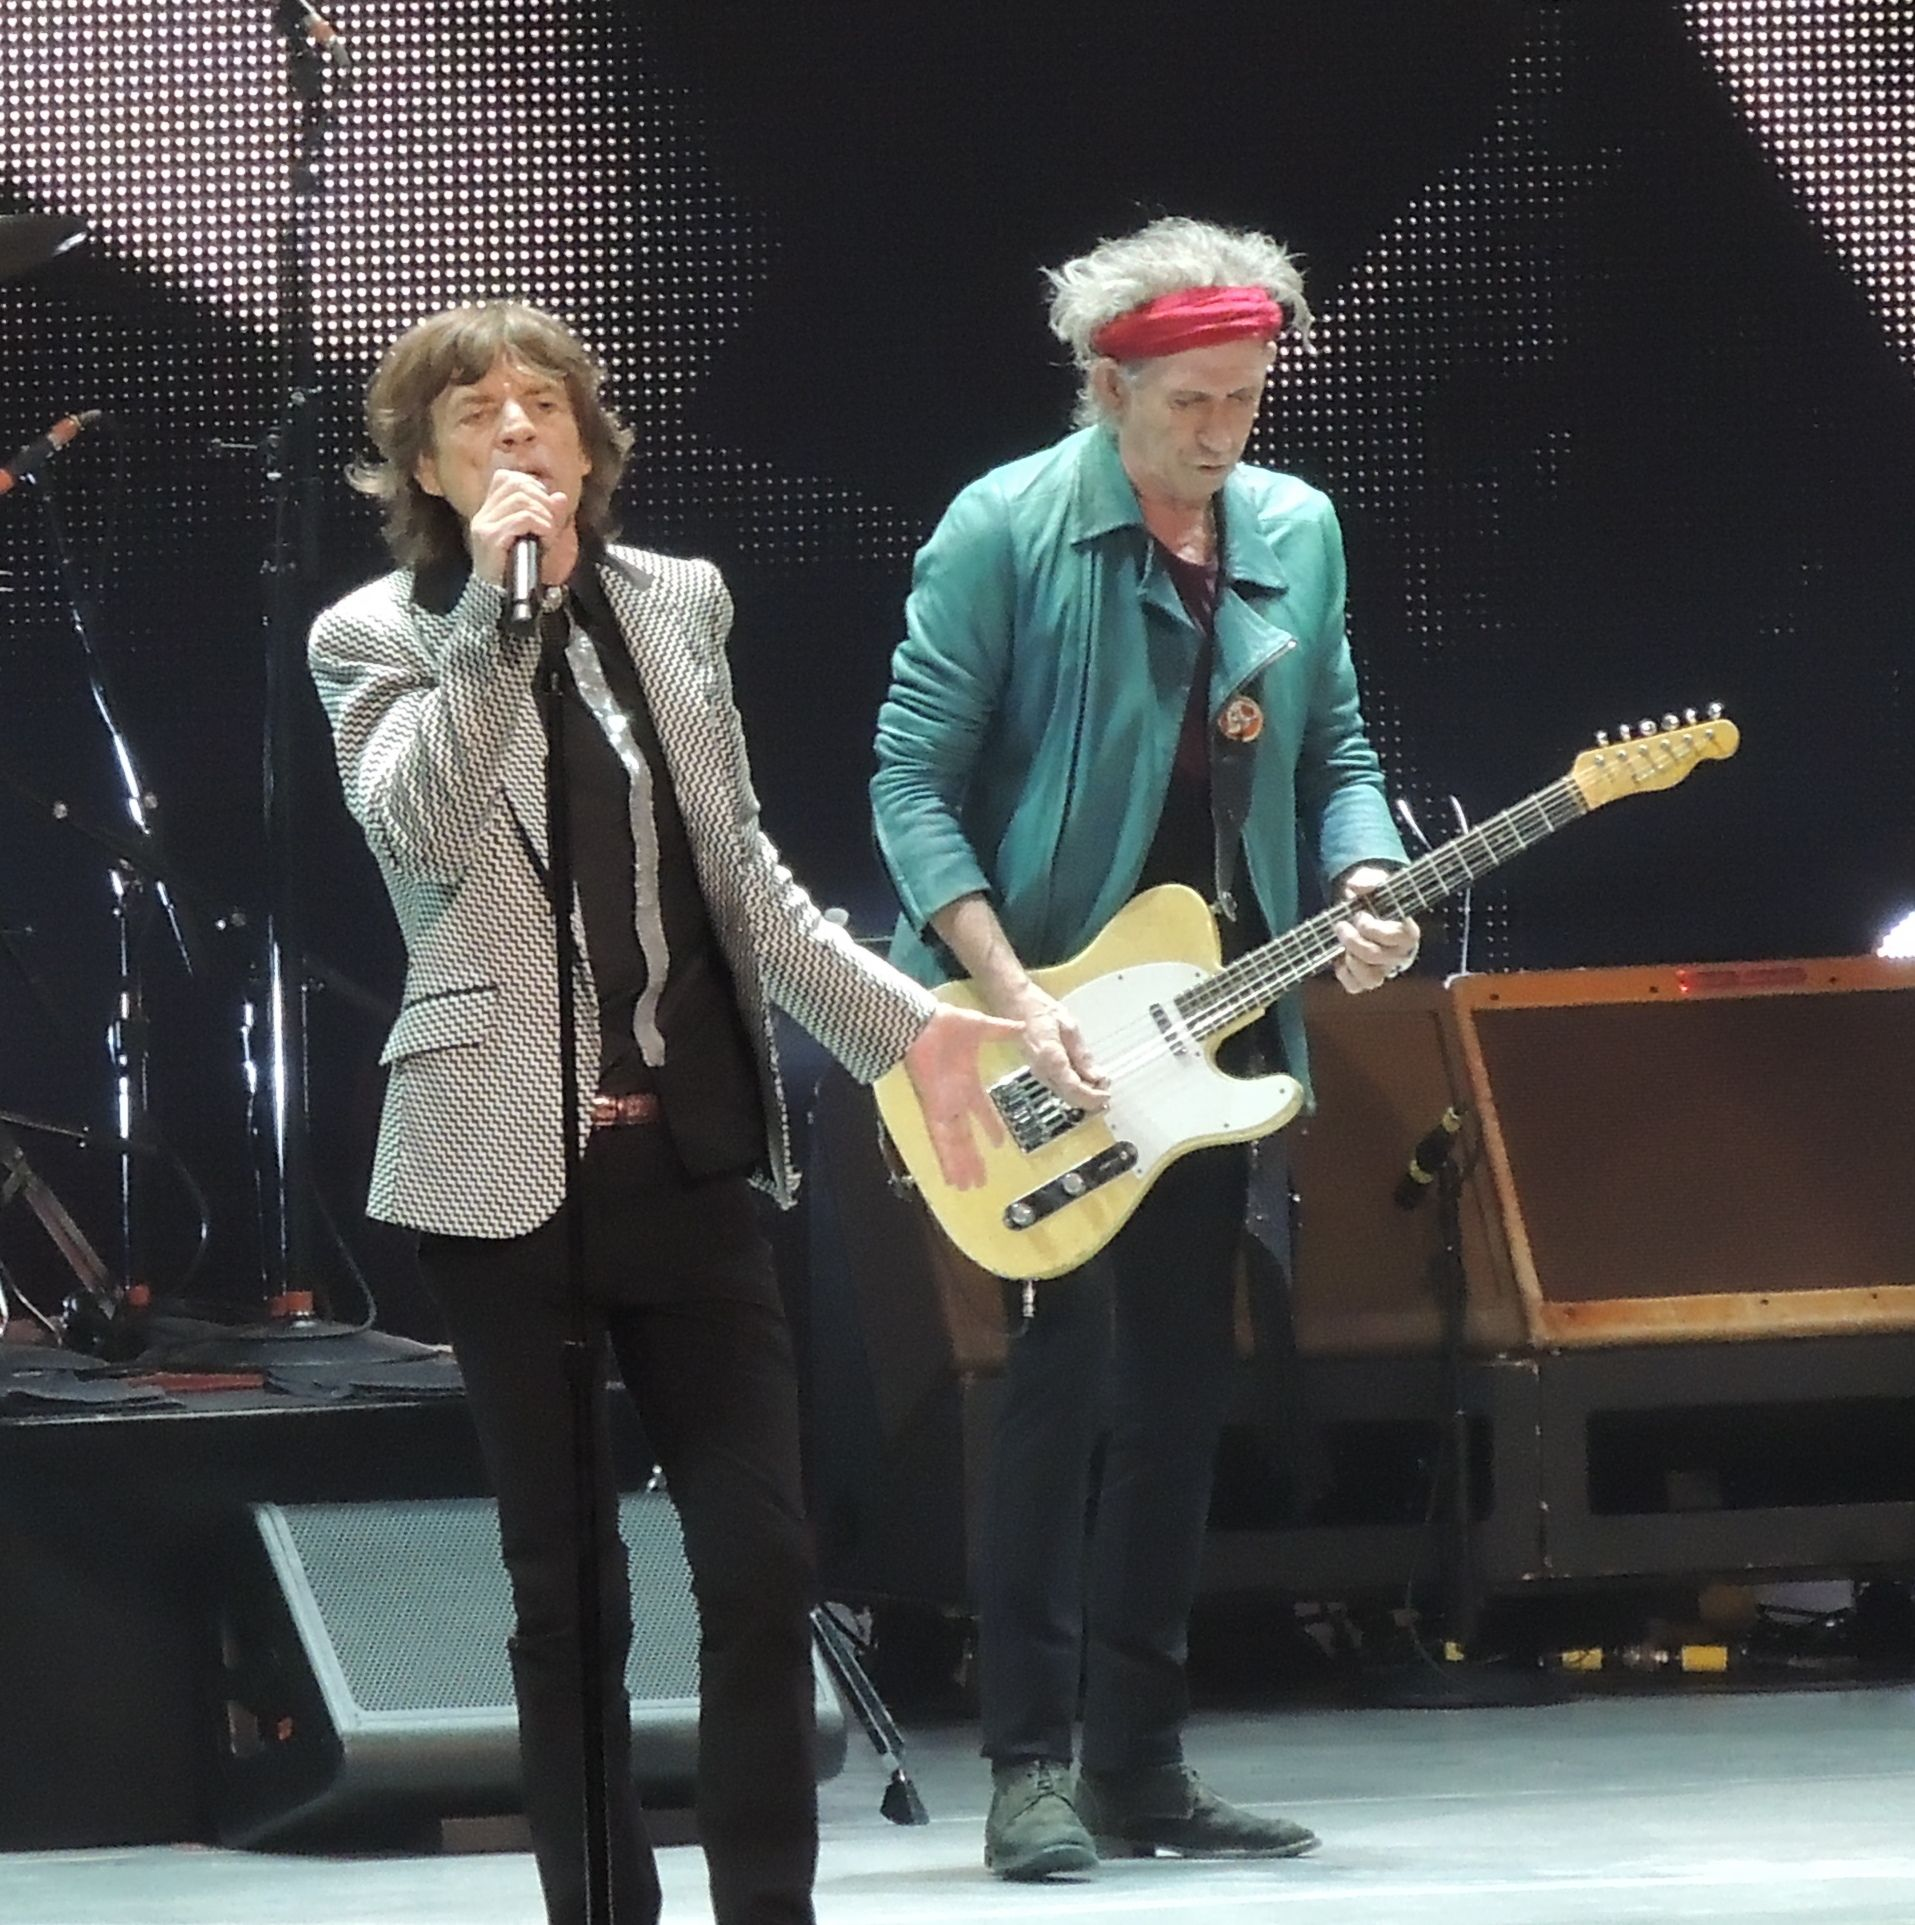 Mick_Jagger_Keith_Richards_Rolling_Stones_2012-12-13.jpg (1915×1925)